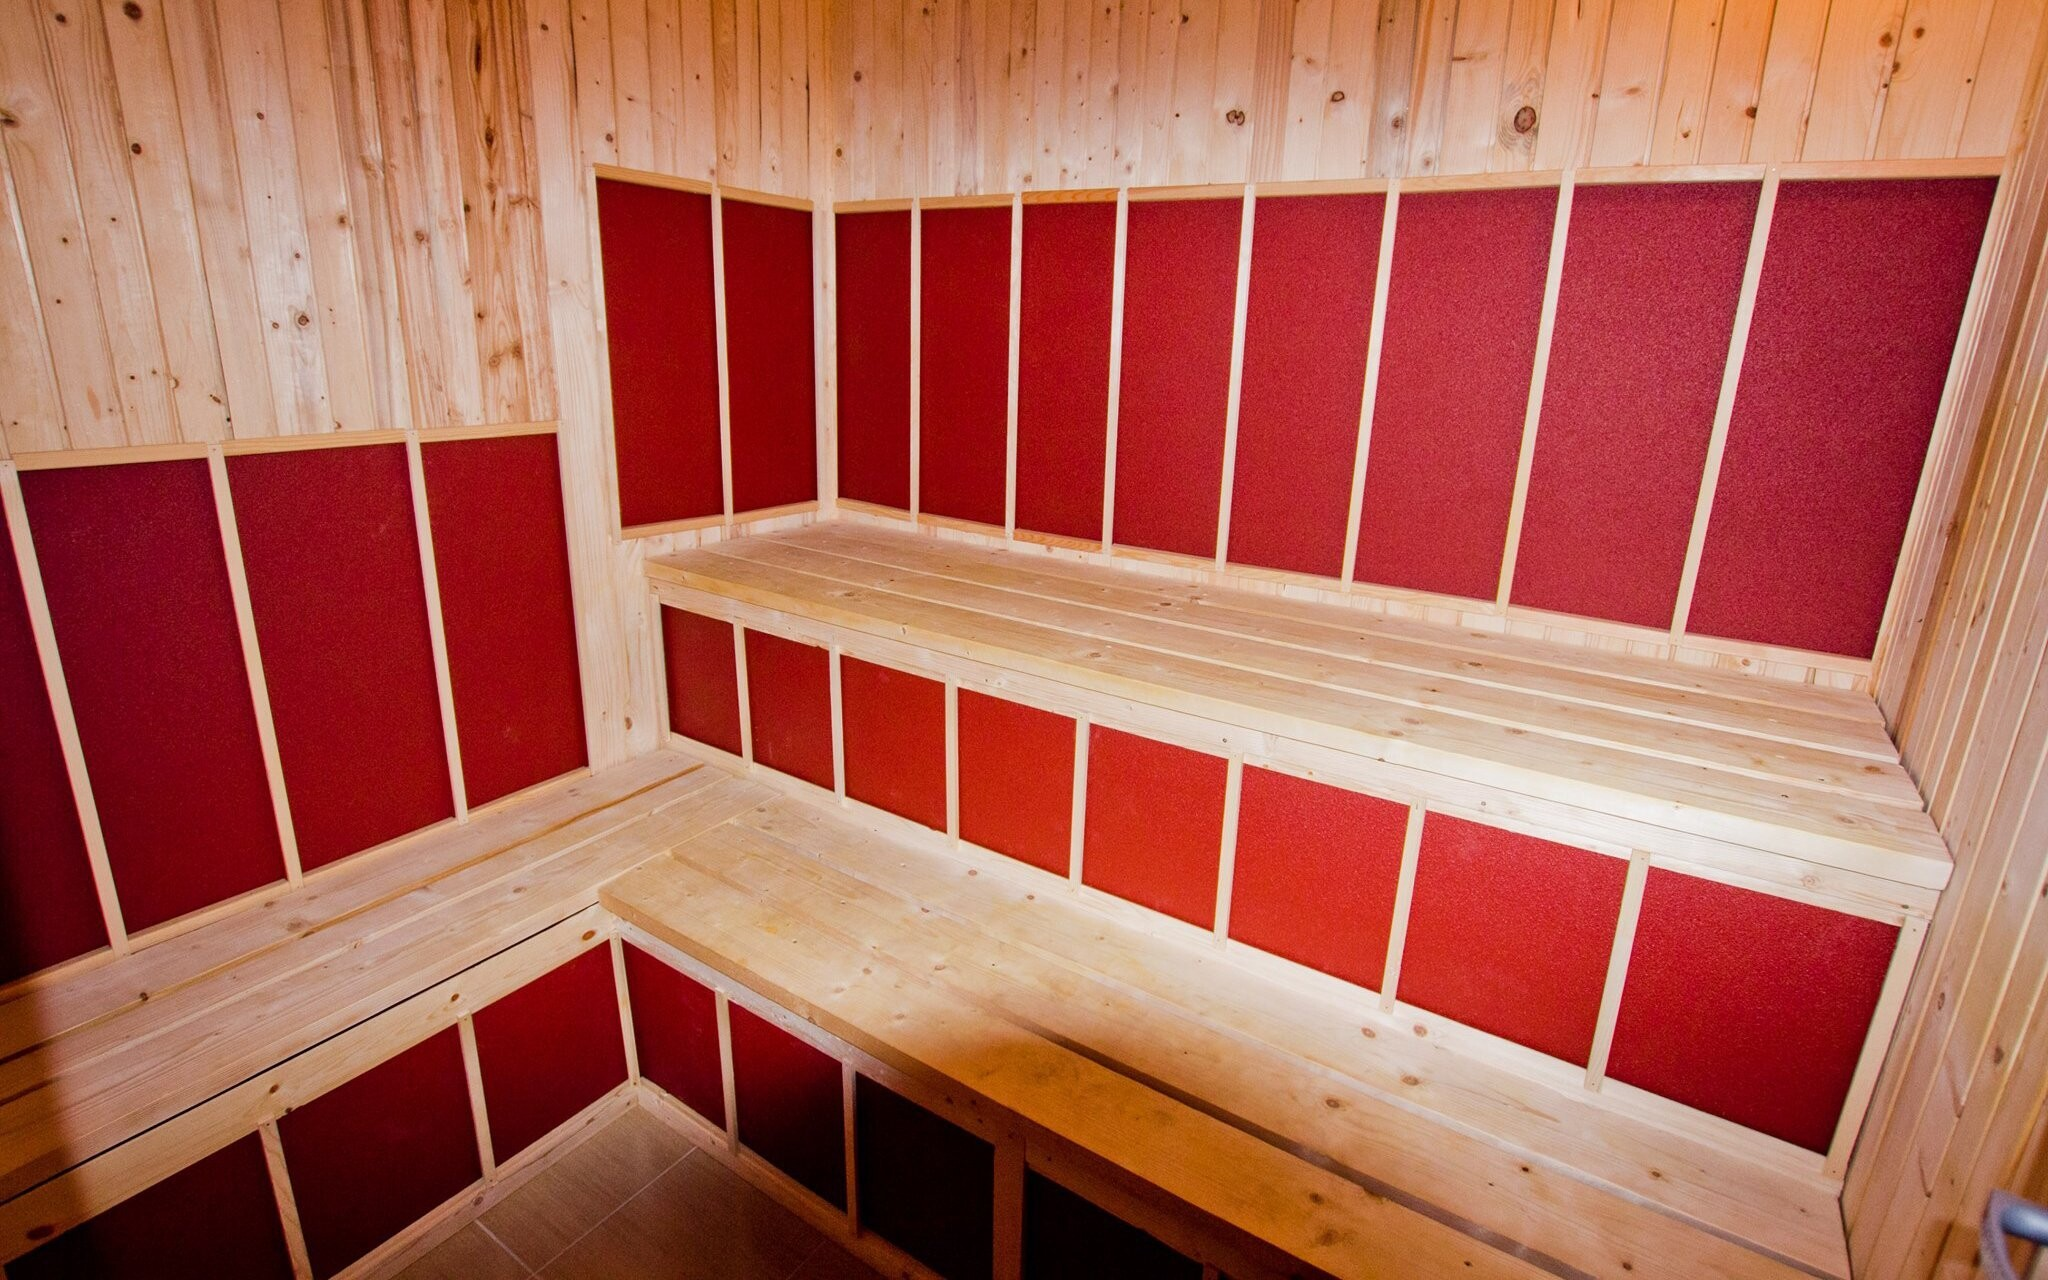 K dispozici budete mít infra saunu